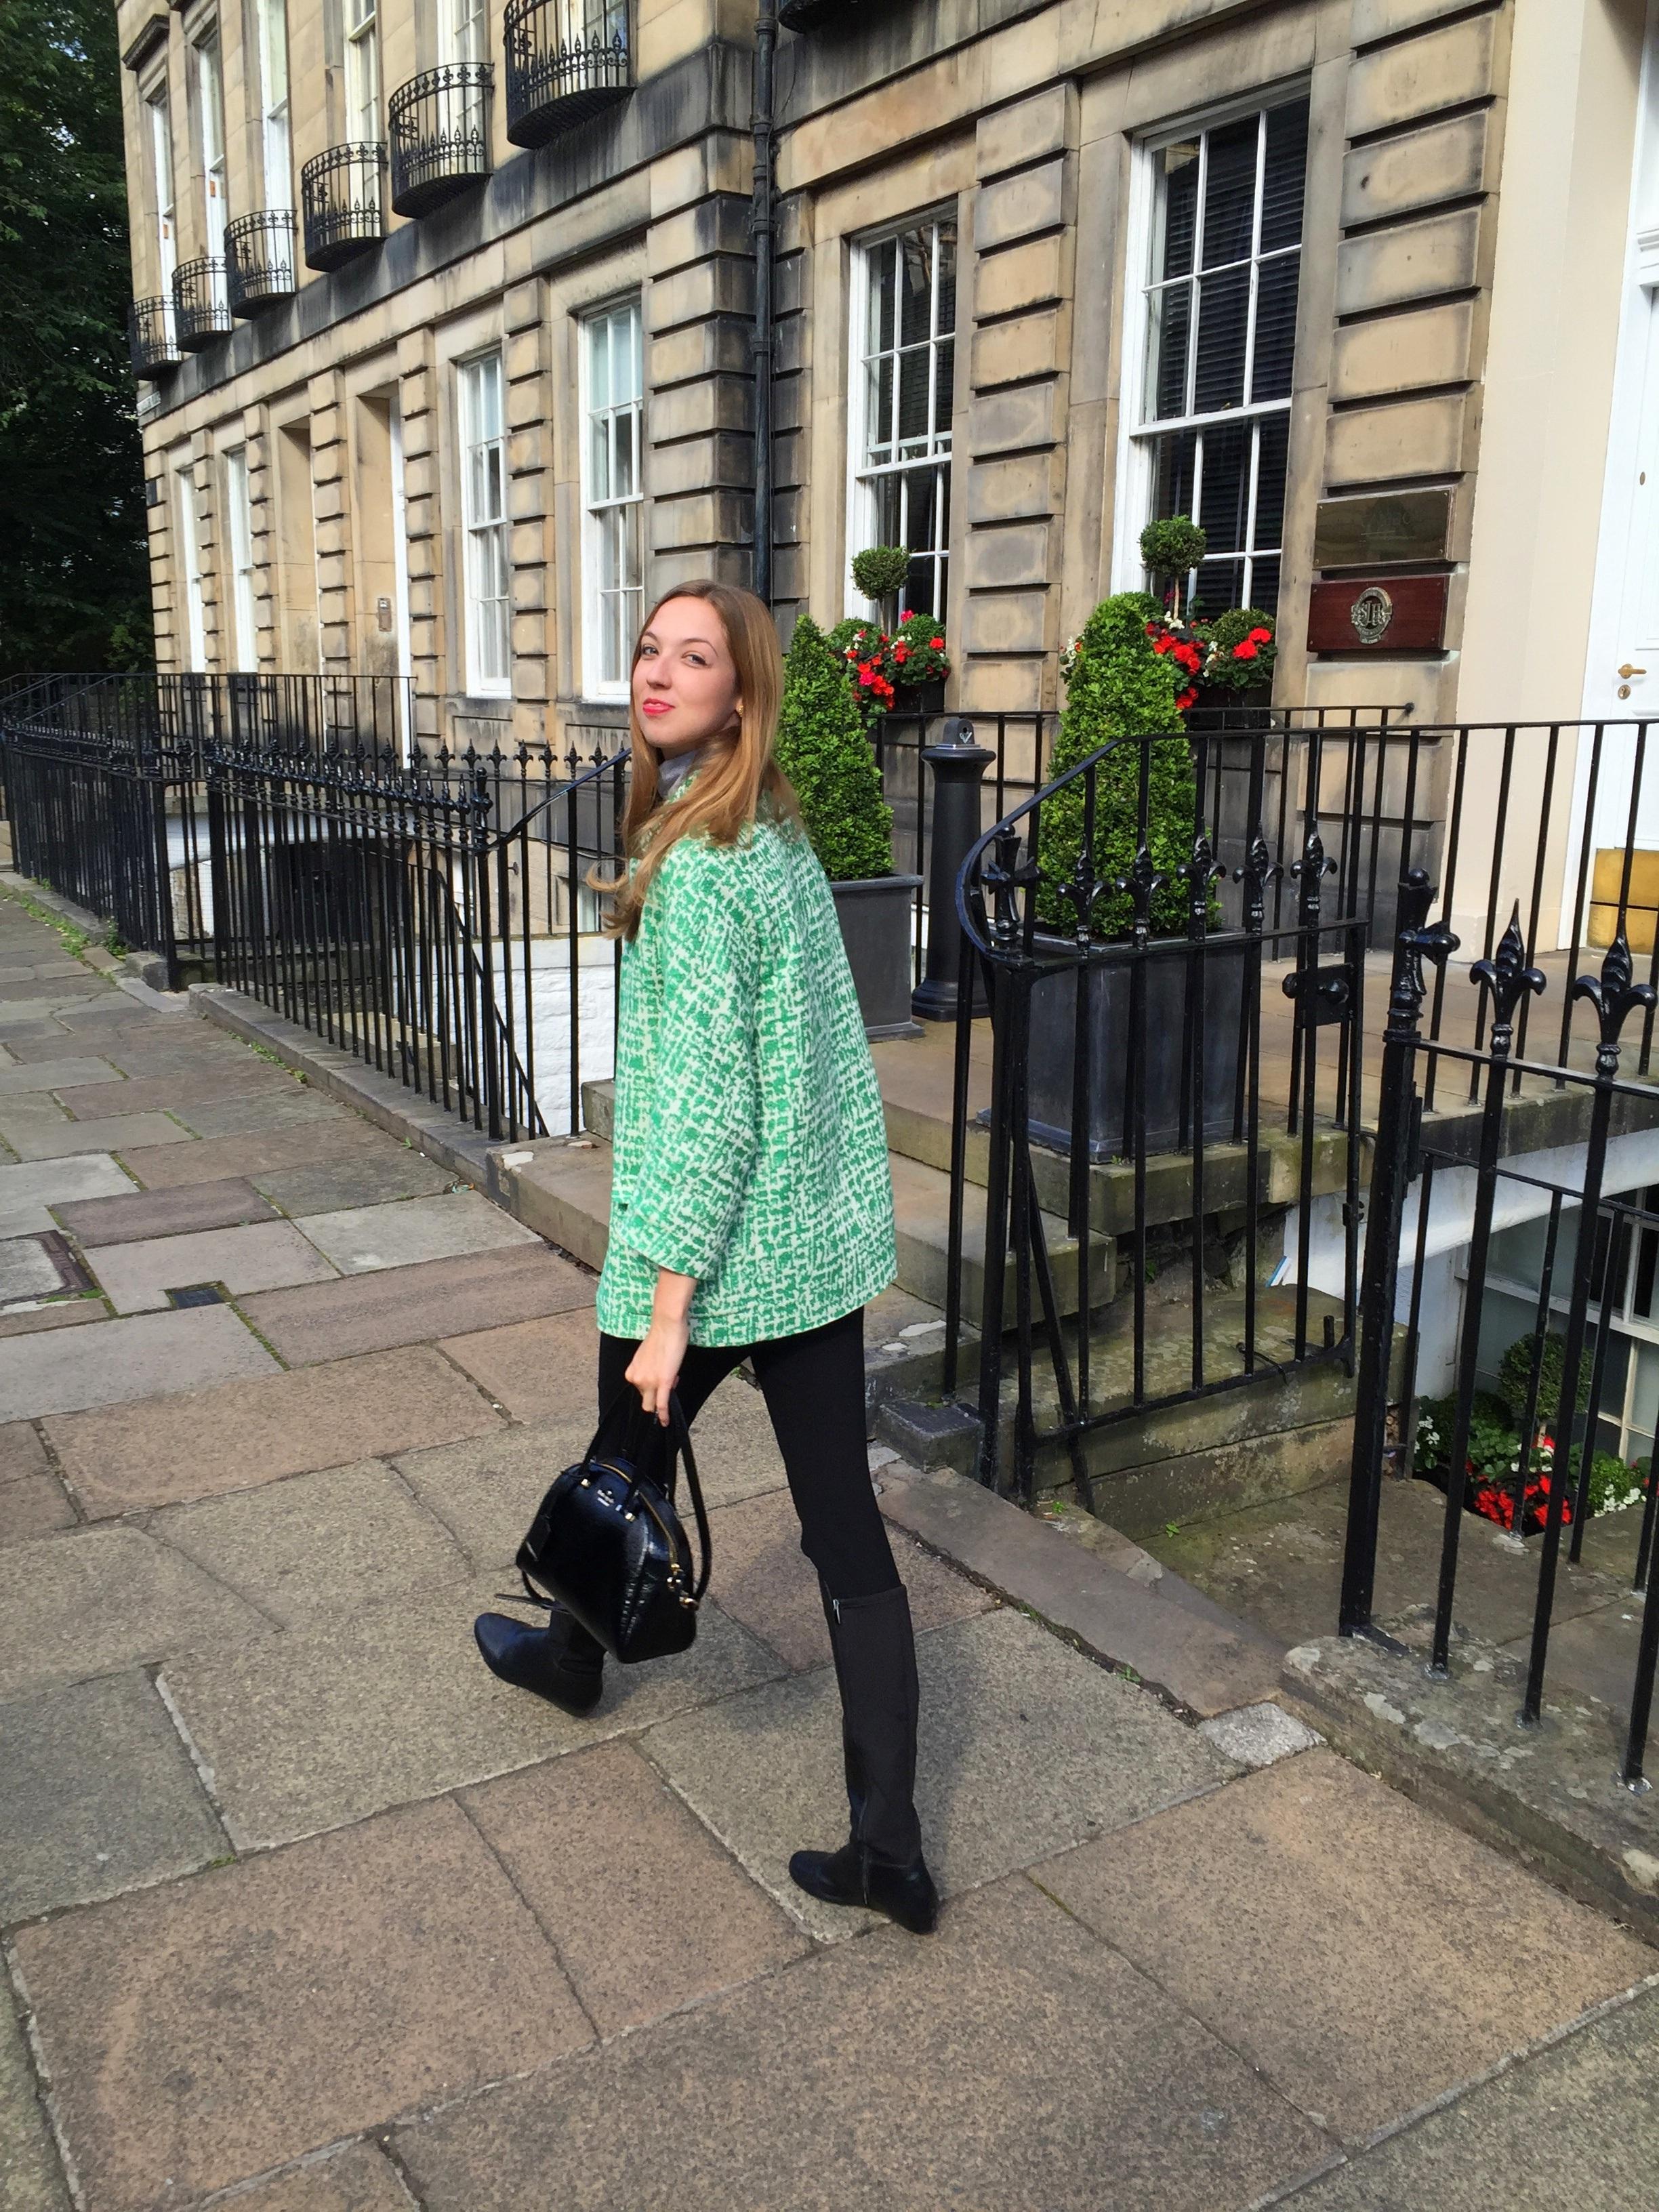 Green coat from Zara in Scotland